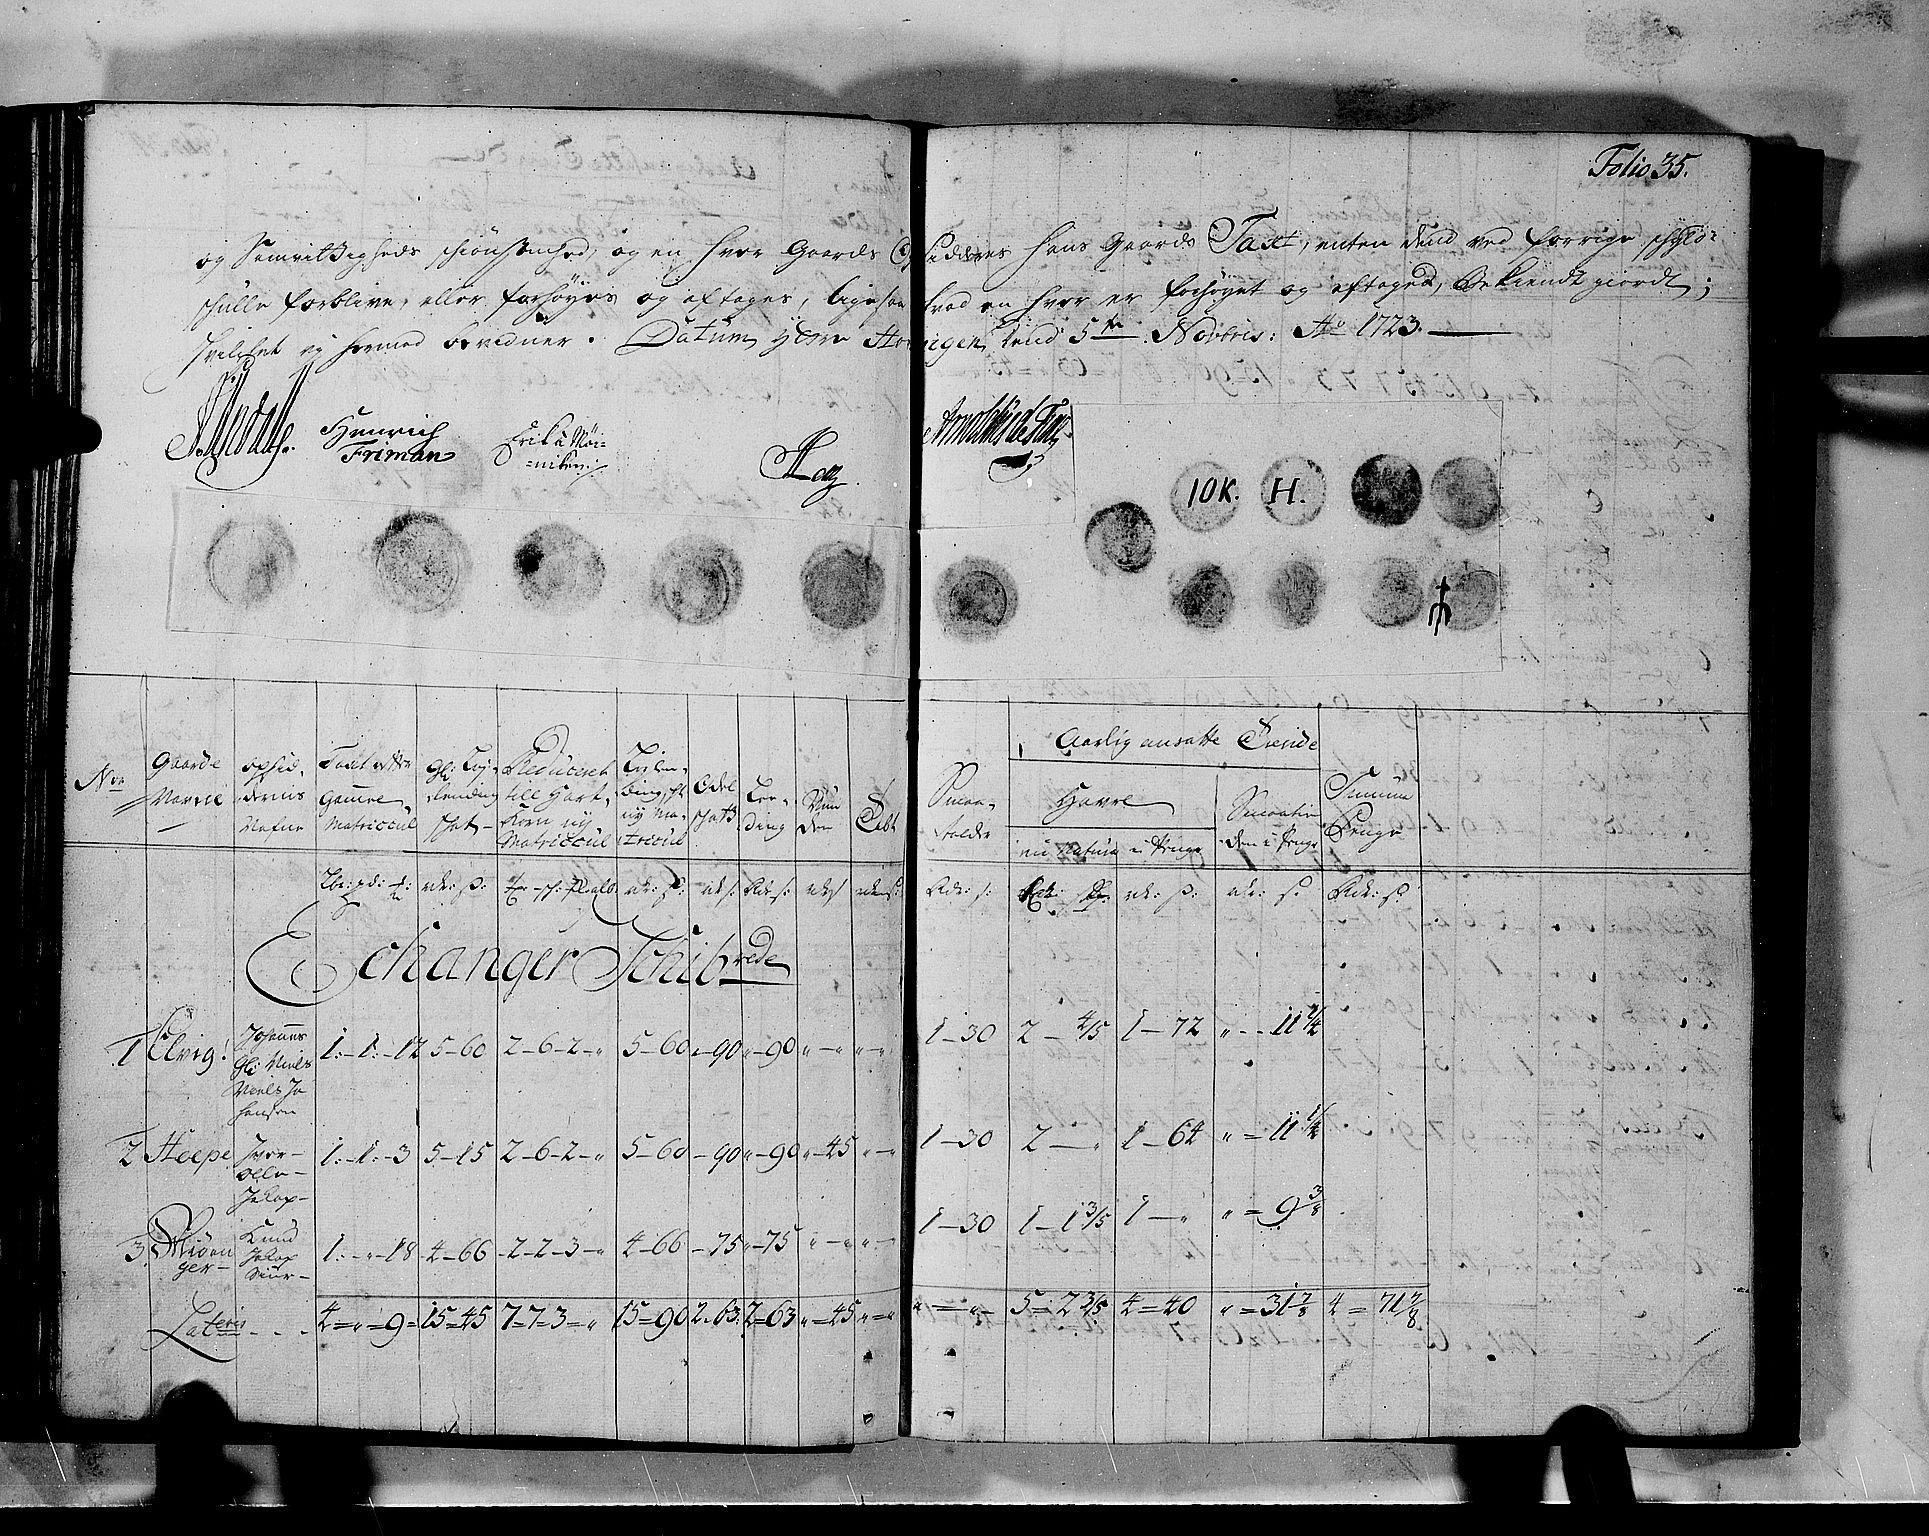 RA, Rentekammeret inntil 1814, Realistisk ordnet avdeling, N/Nb/Nbf/L0140: Nordhordland matrikkelprotokoll, 1723, s. 34b-35a